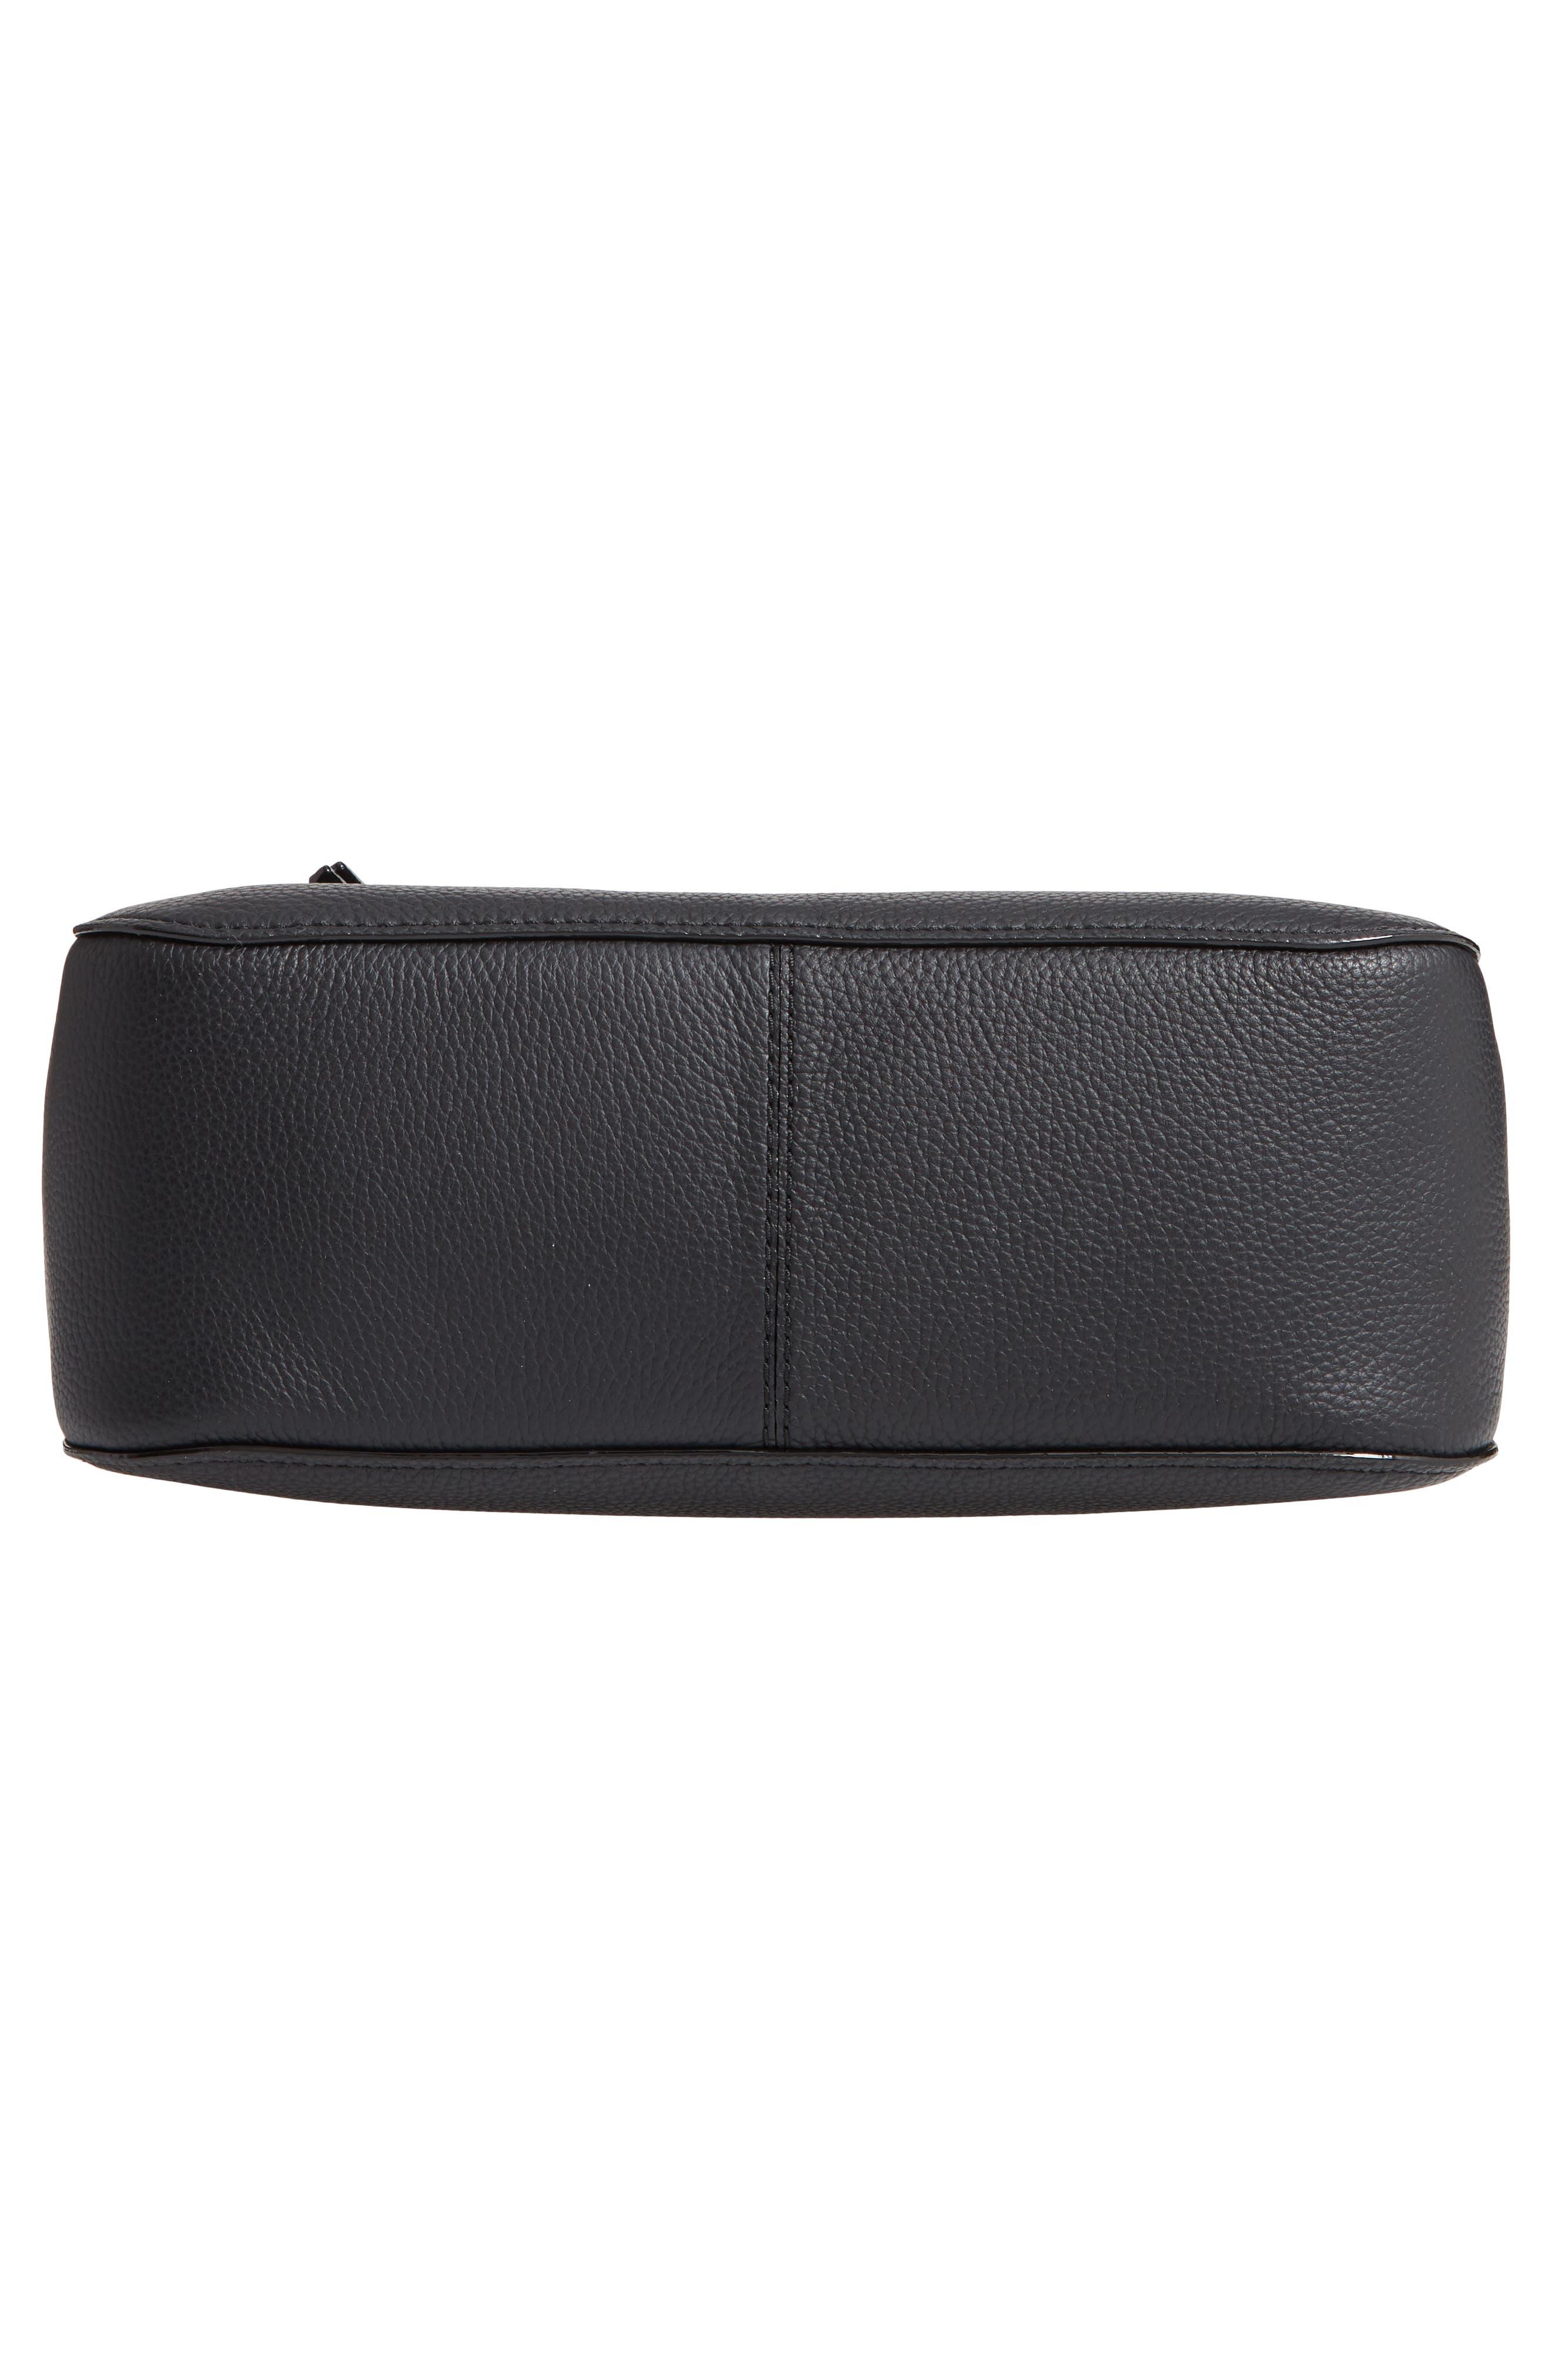 jackson street - quincy leather hobo,                             Alternate thumbnail 6, color,                             BLACK